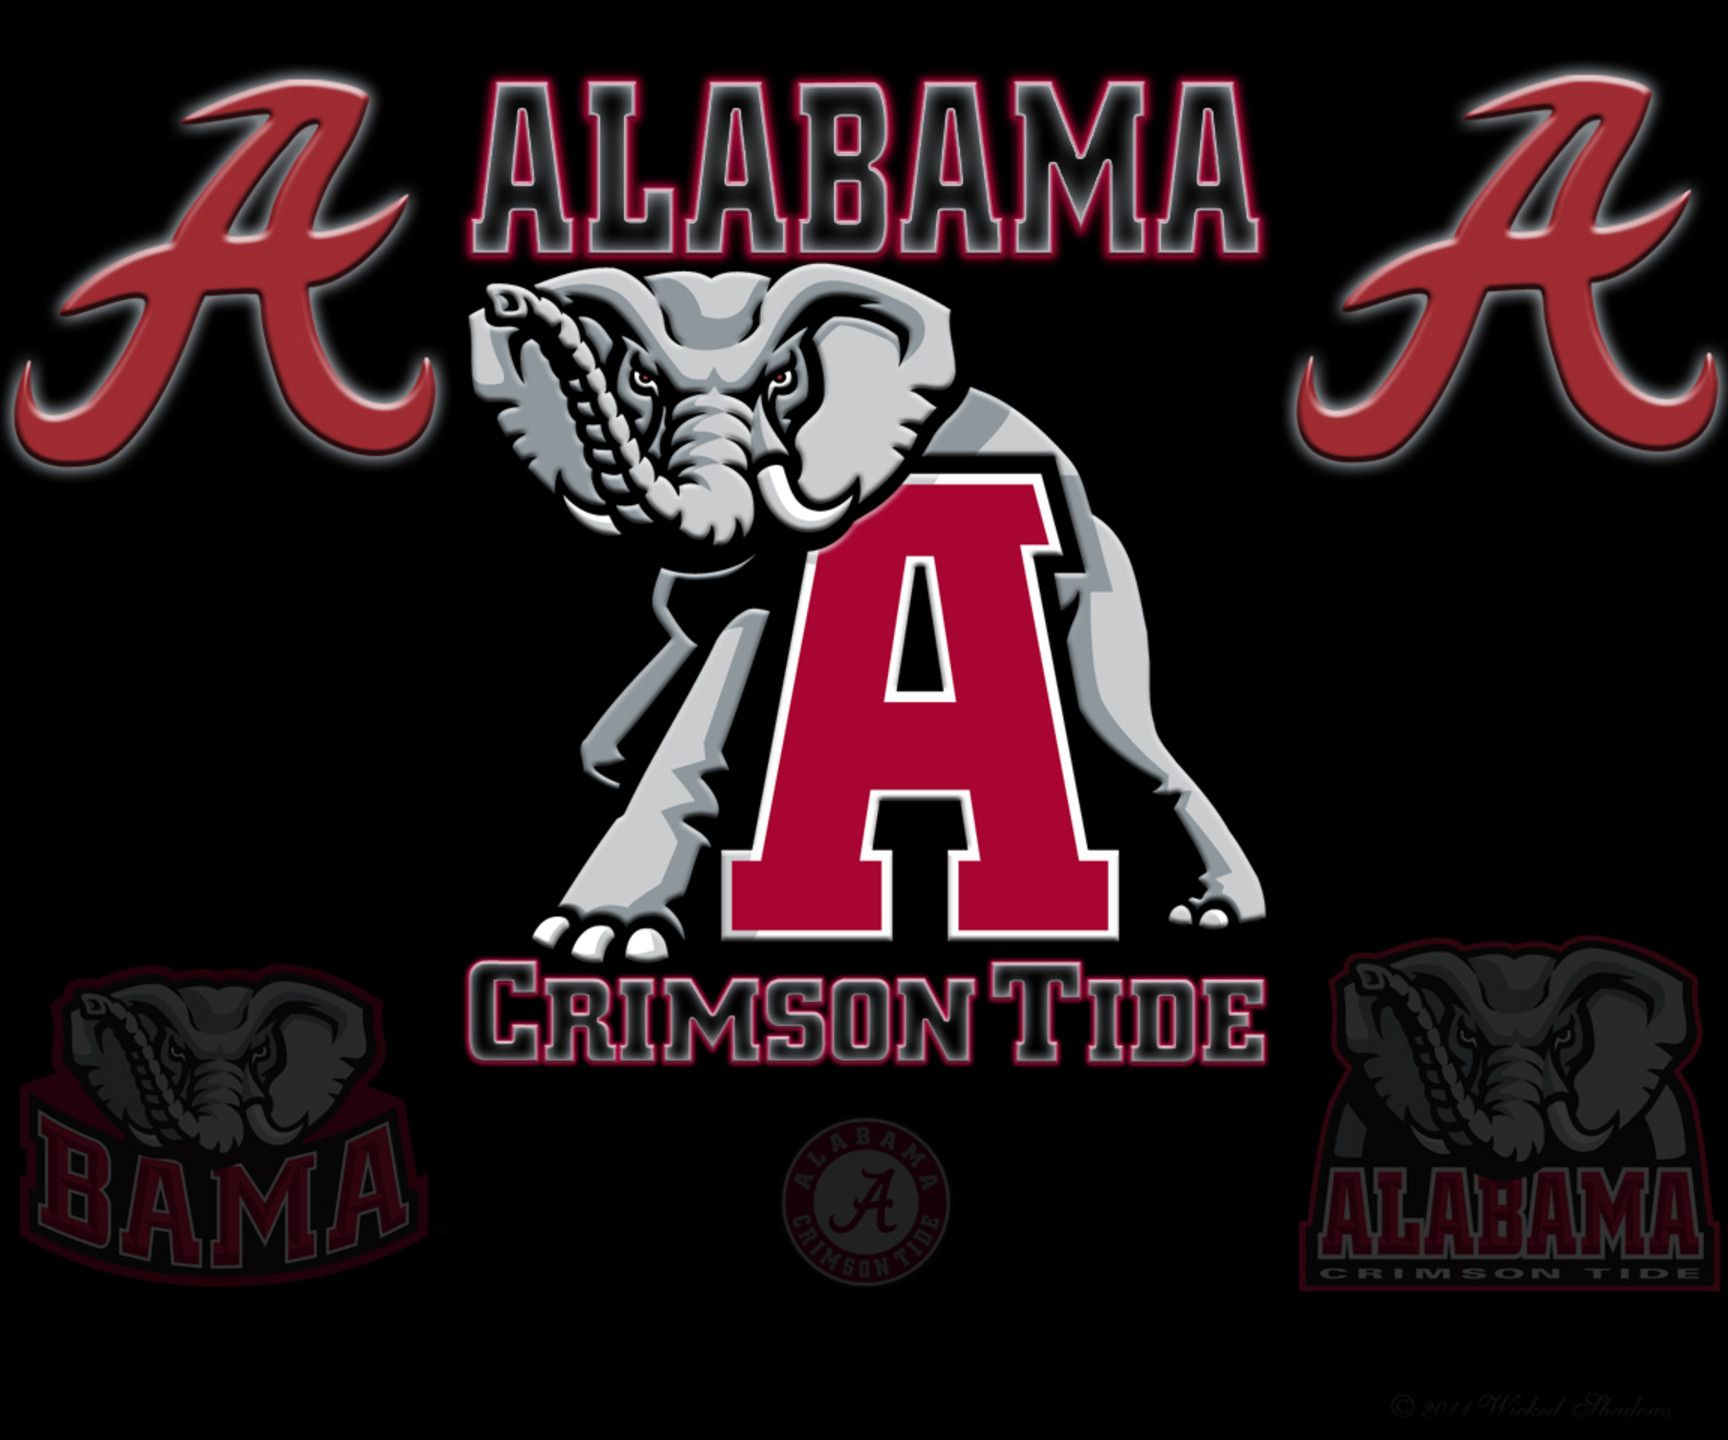 2015 Cool Alabama Football Backgrounds 1728x1440